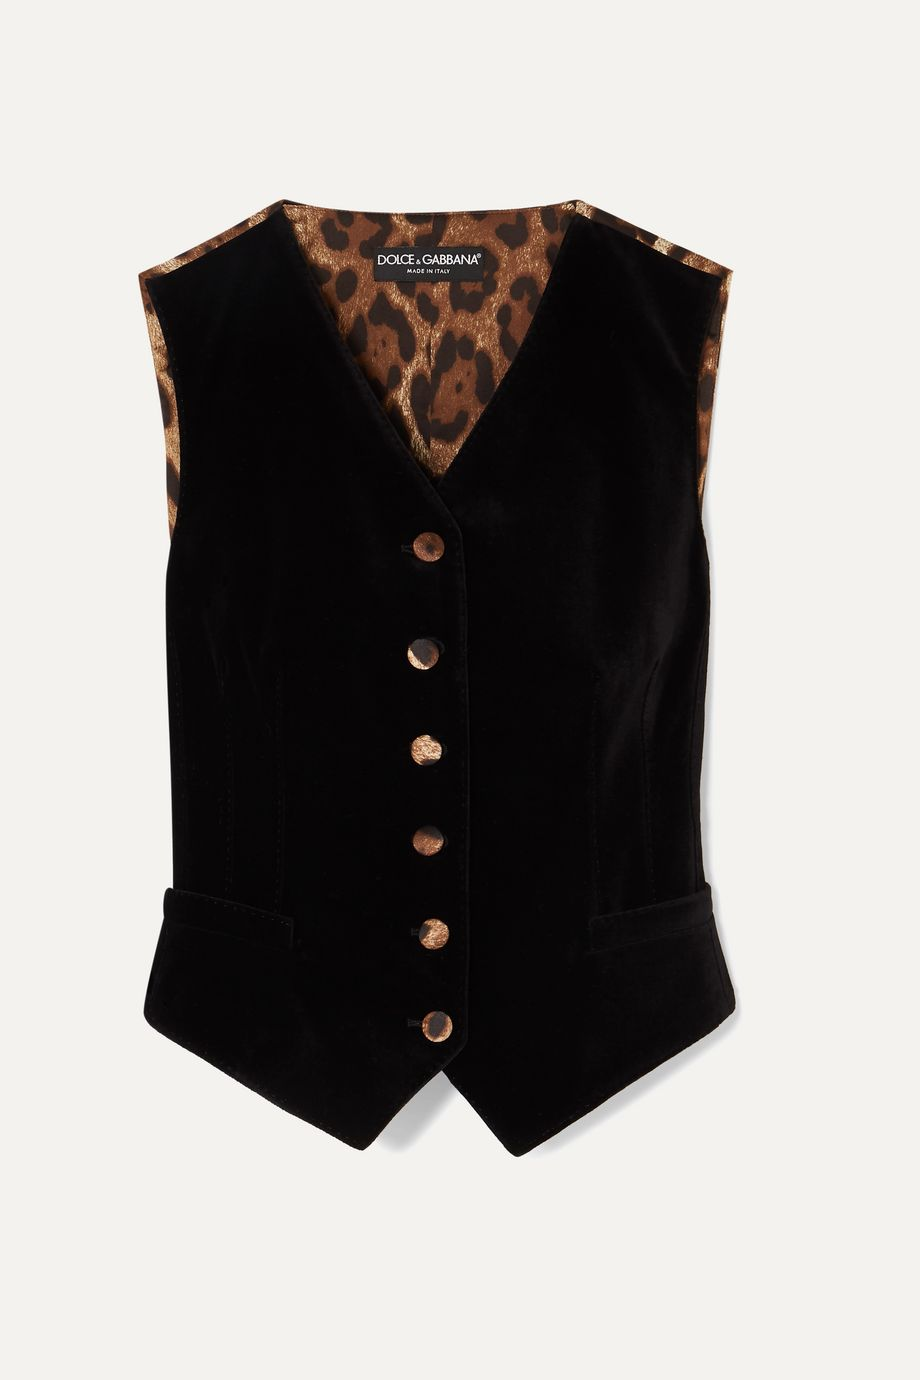 Dolce & Gabbana Cotton-blend velvet and leopard-print satin vest